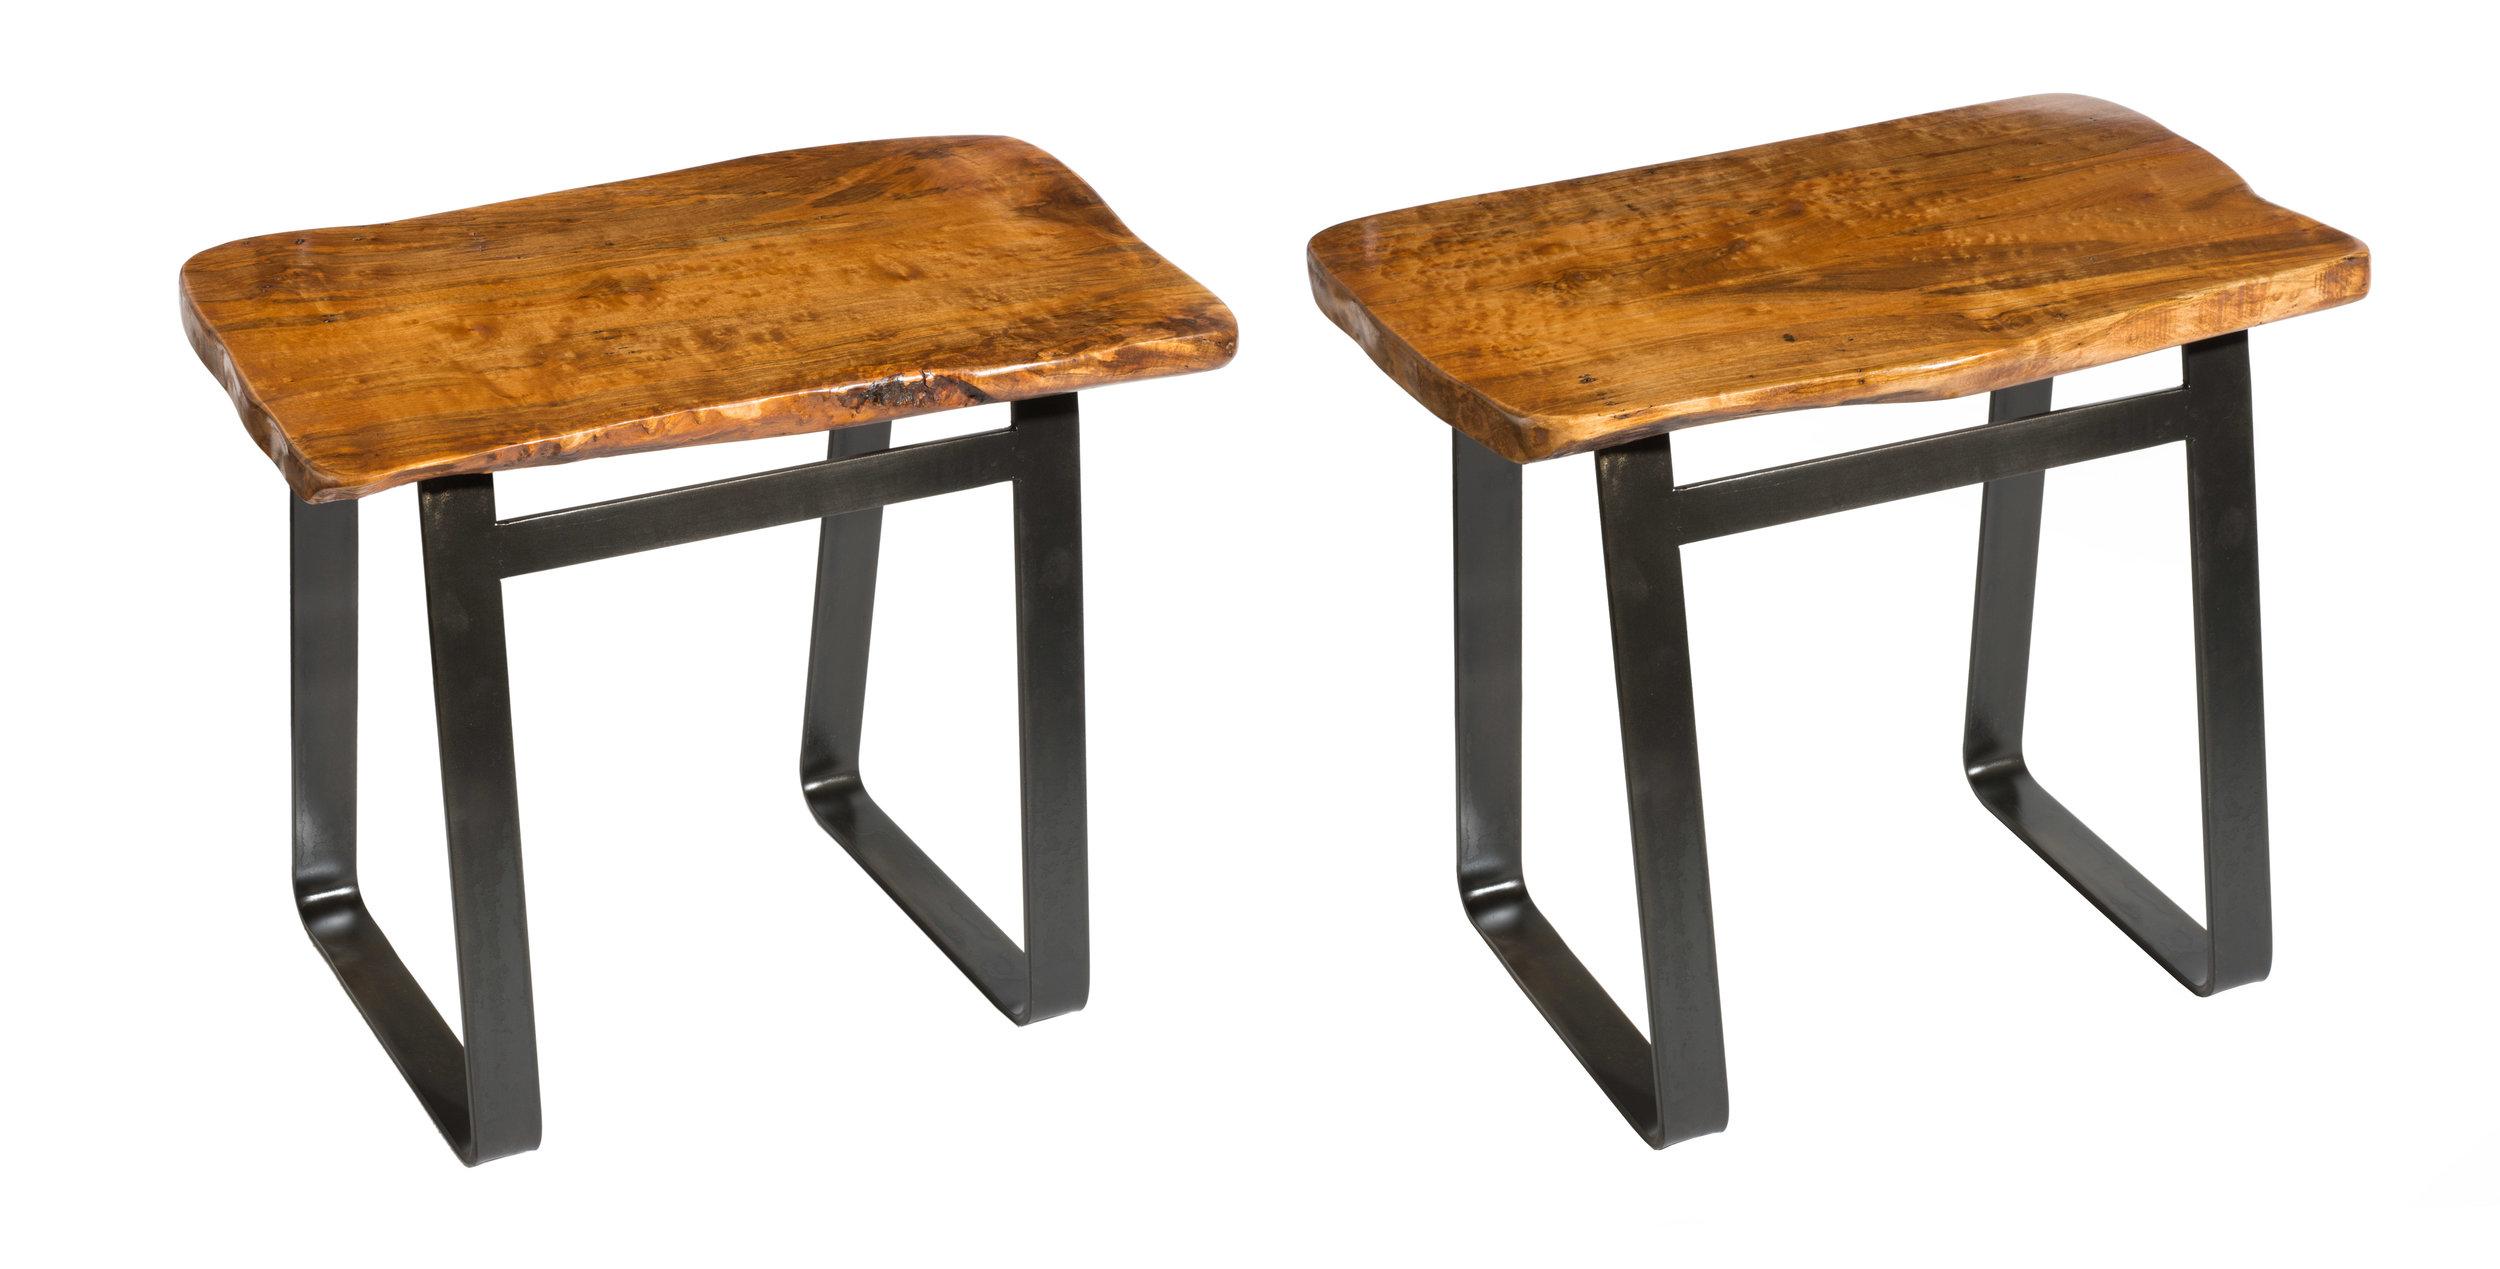 hess end table pair.jpg